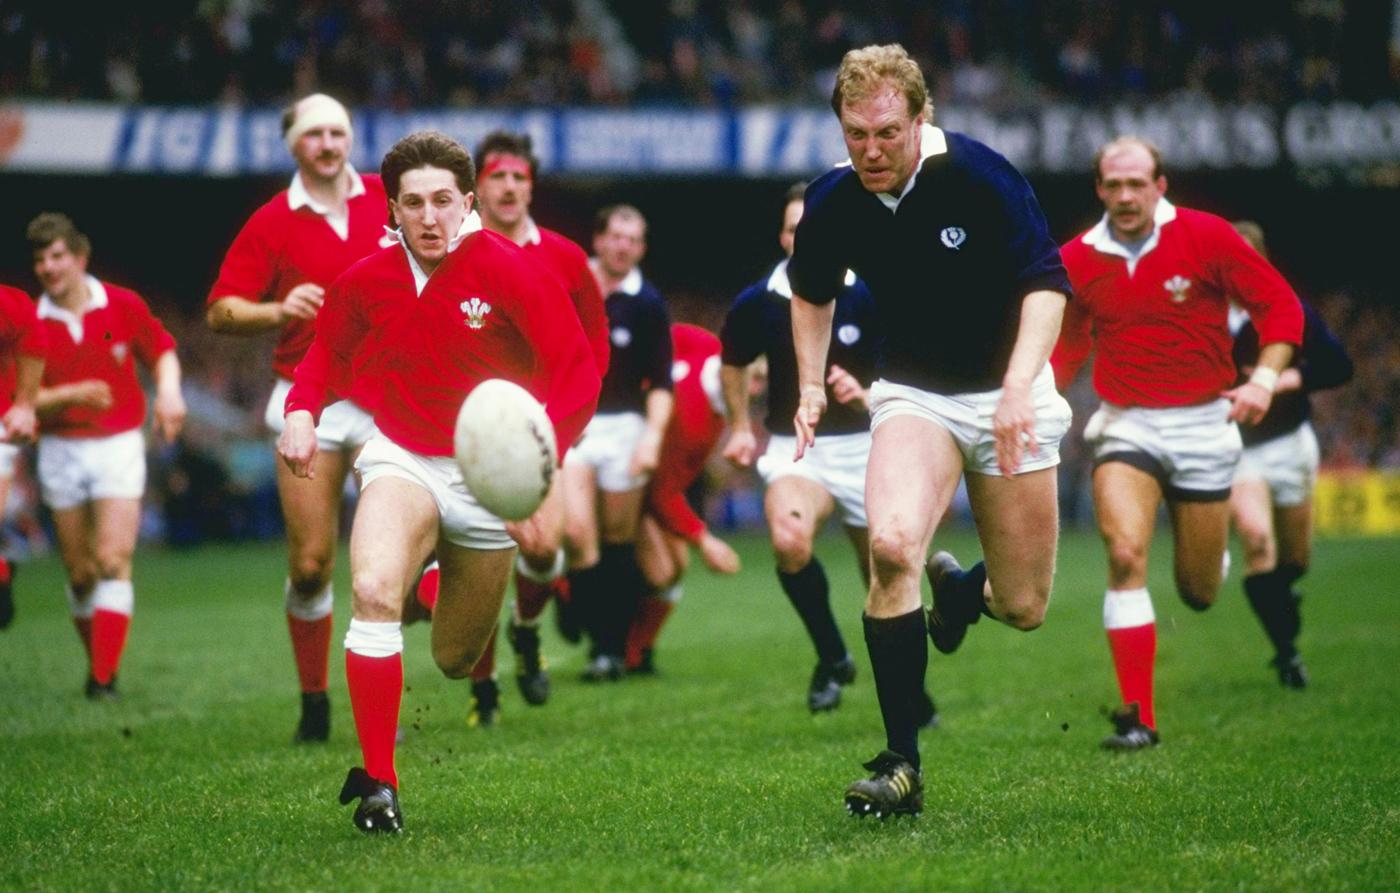 A game amongst political turmoil, Scotland vs Wales